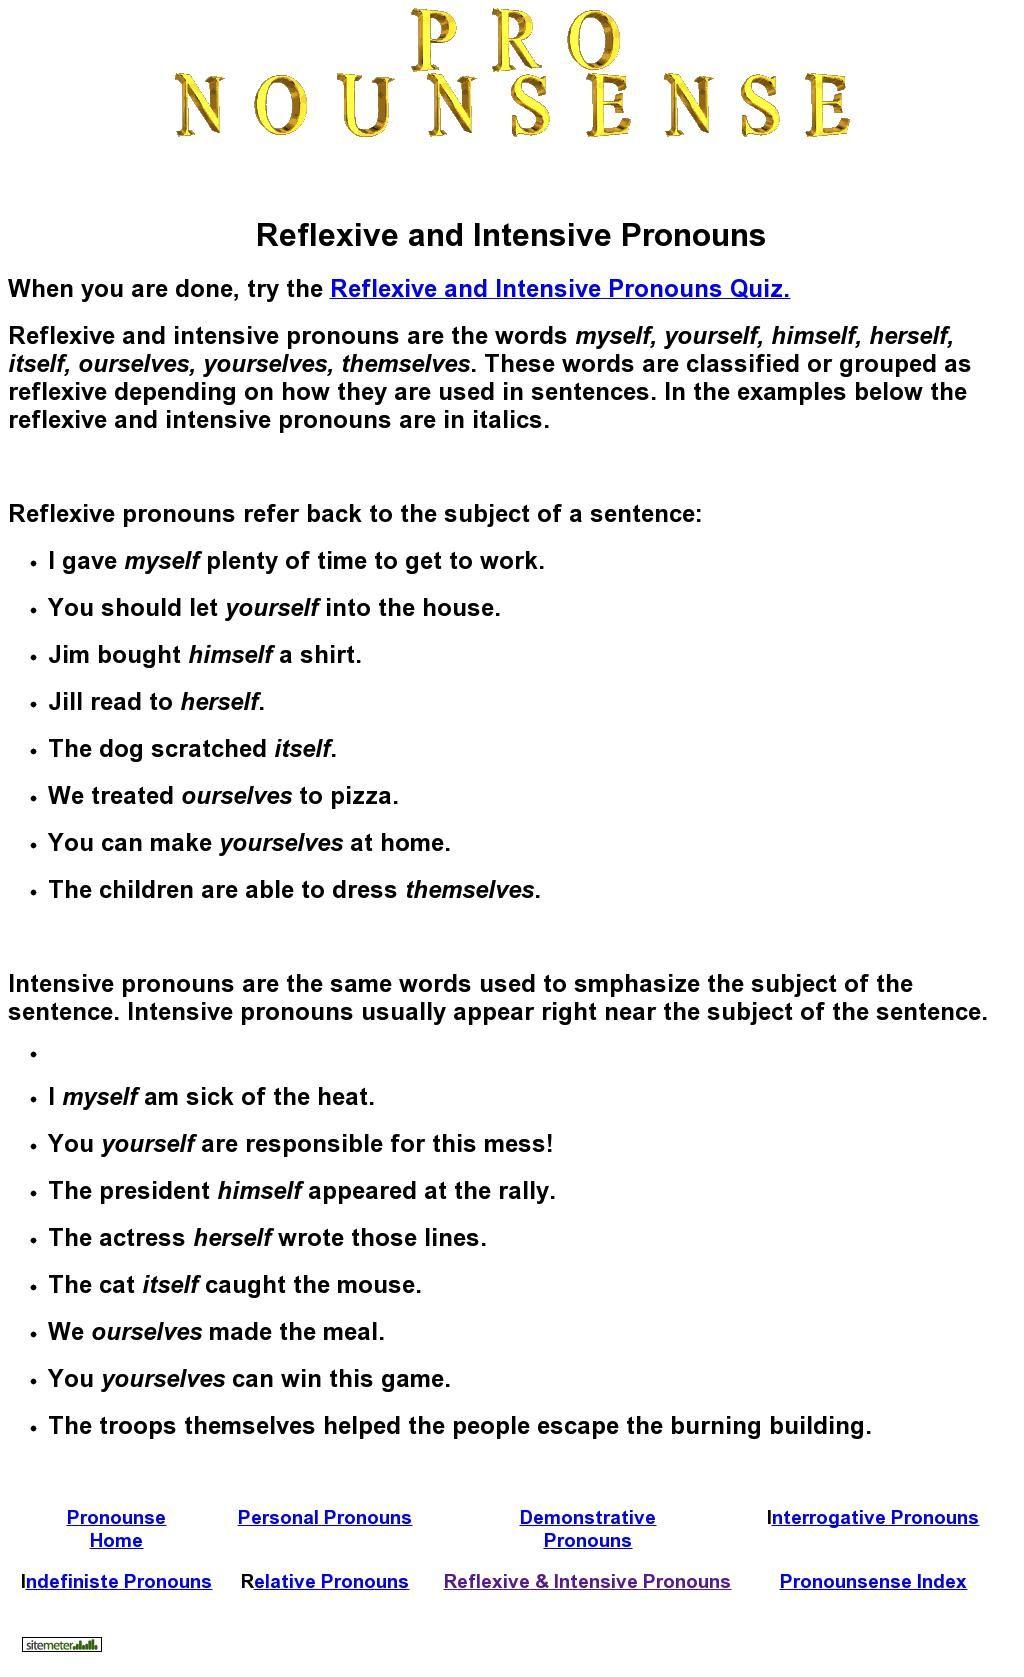 worksheet Relative Pronoun Worksheet reflexive and intensive pronouns quiz from nounsense pronoun nounsense